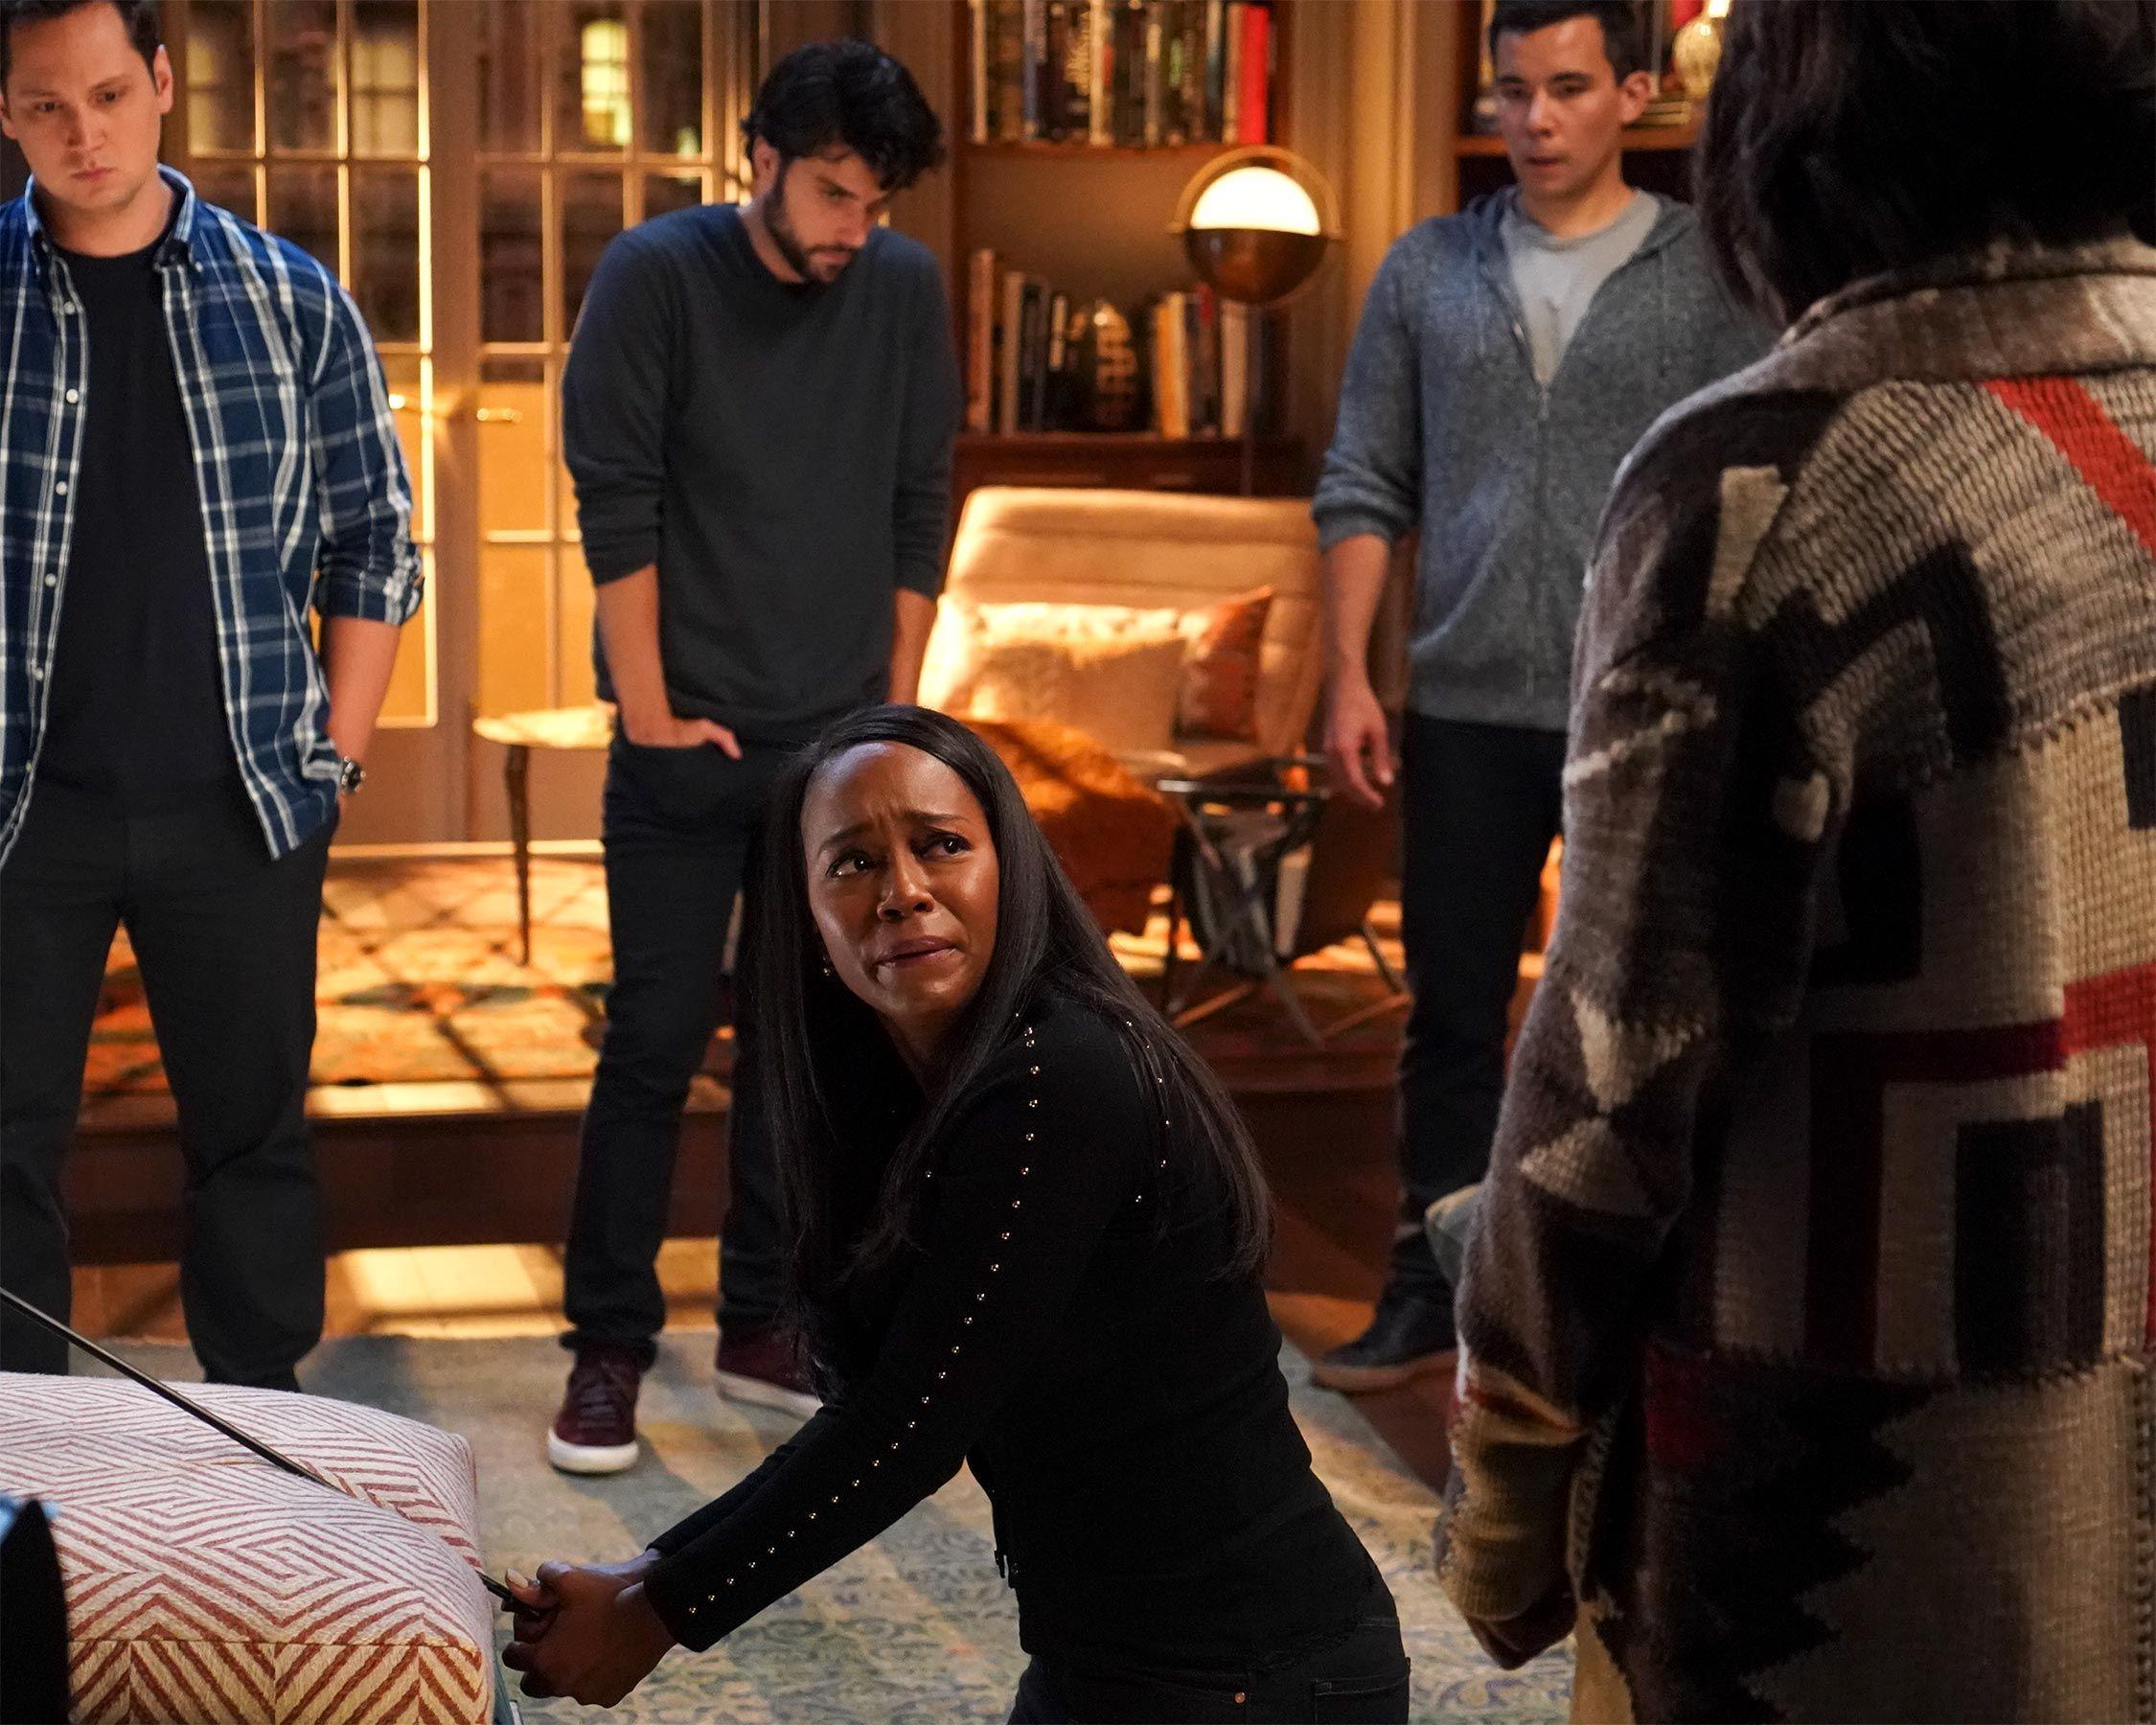 a0e225a2a525af80d52808272923342d - How To Get Away With Murder Episode Recap Season 4